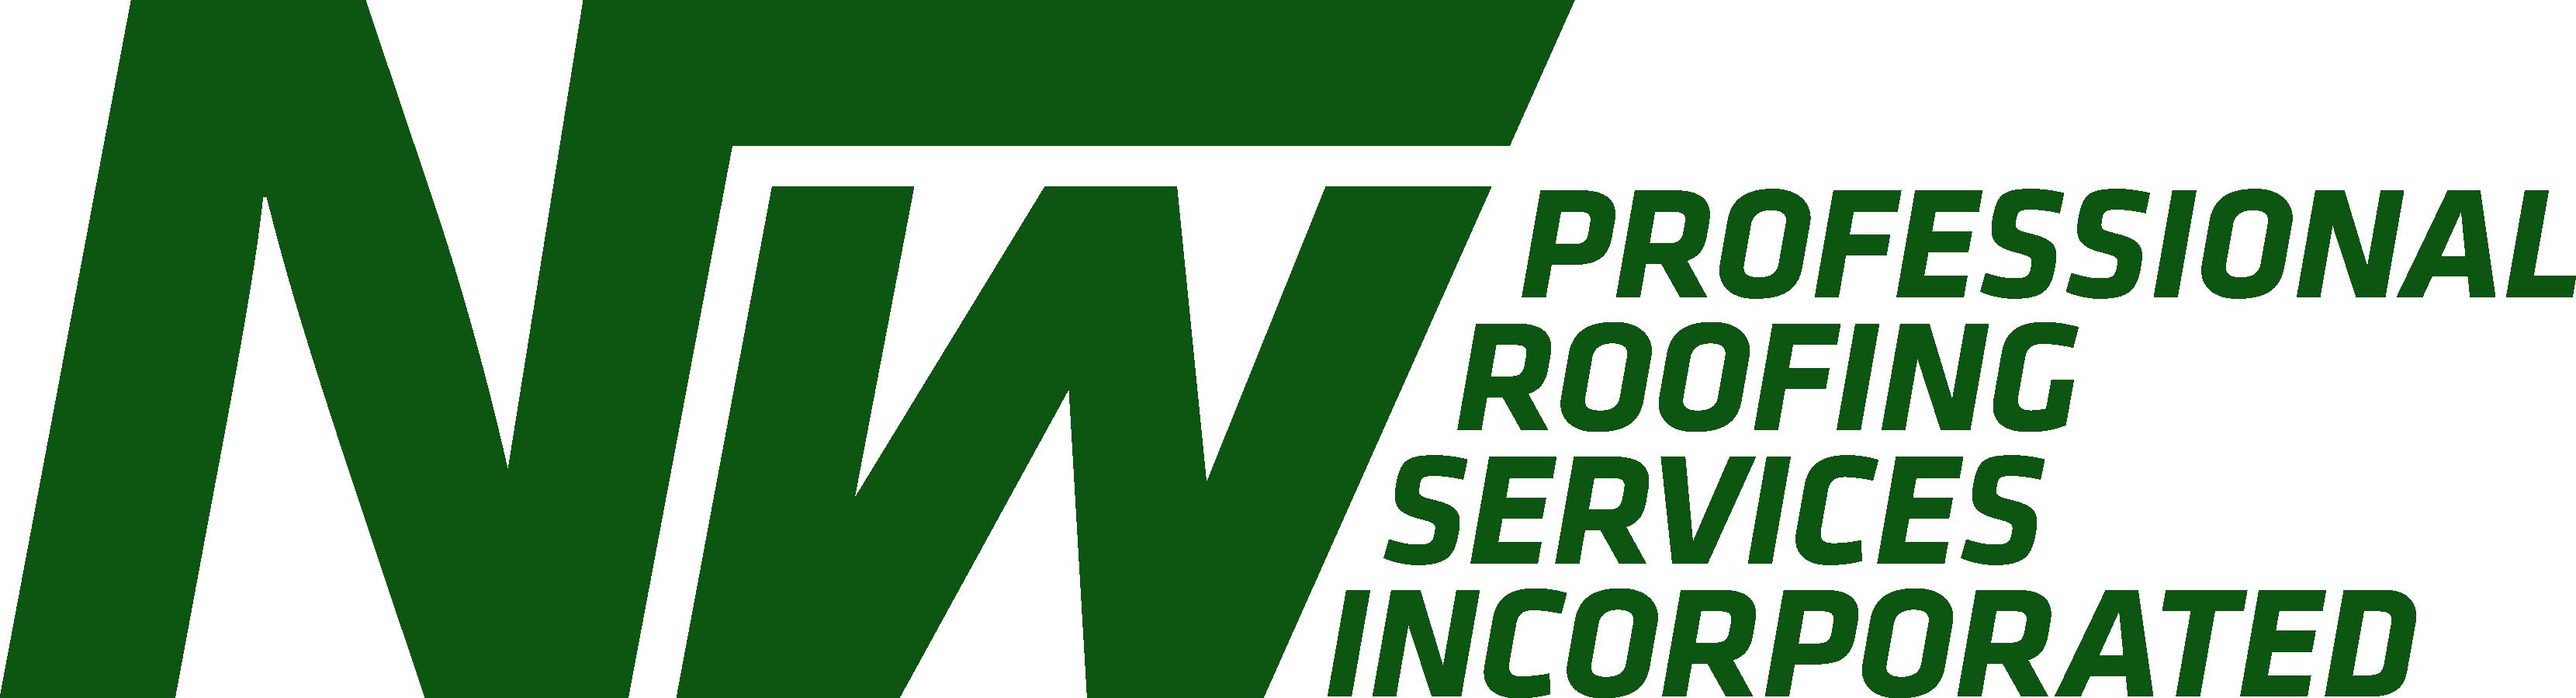 NW-logo03_green